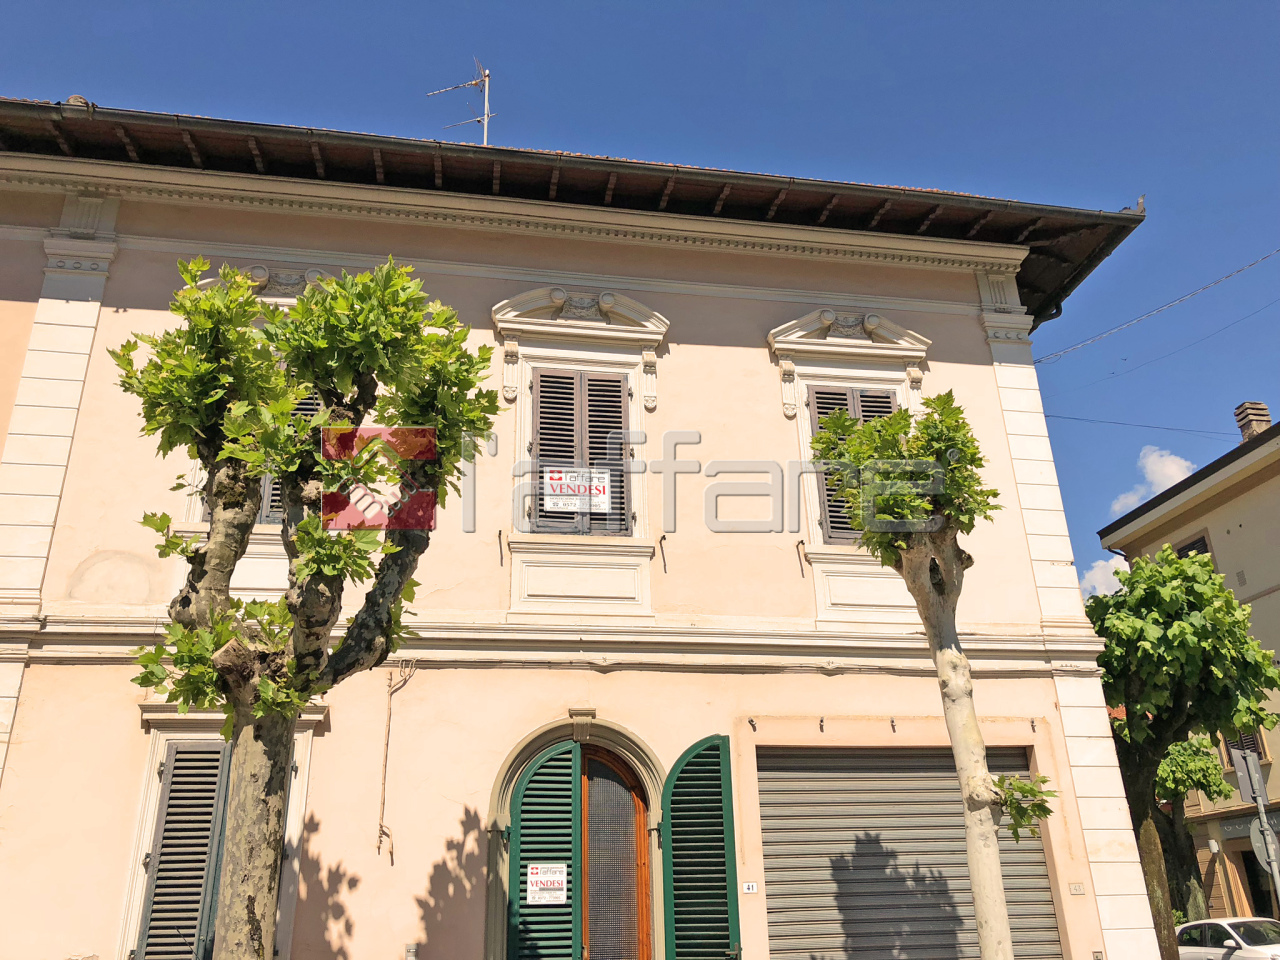 Montecatini-Terme (4/5)